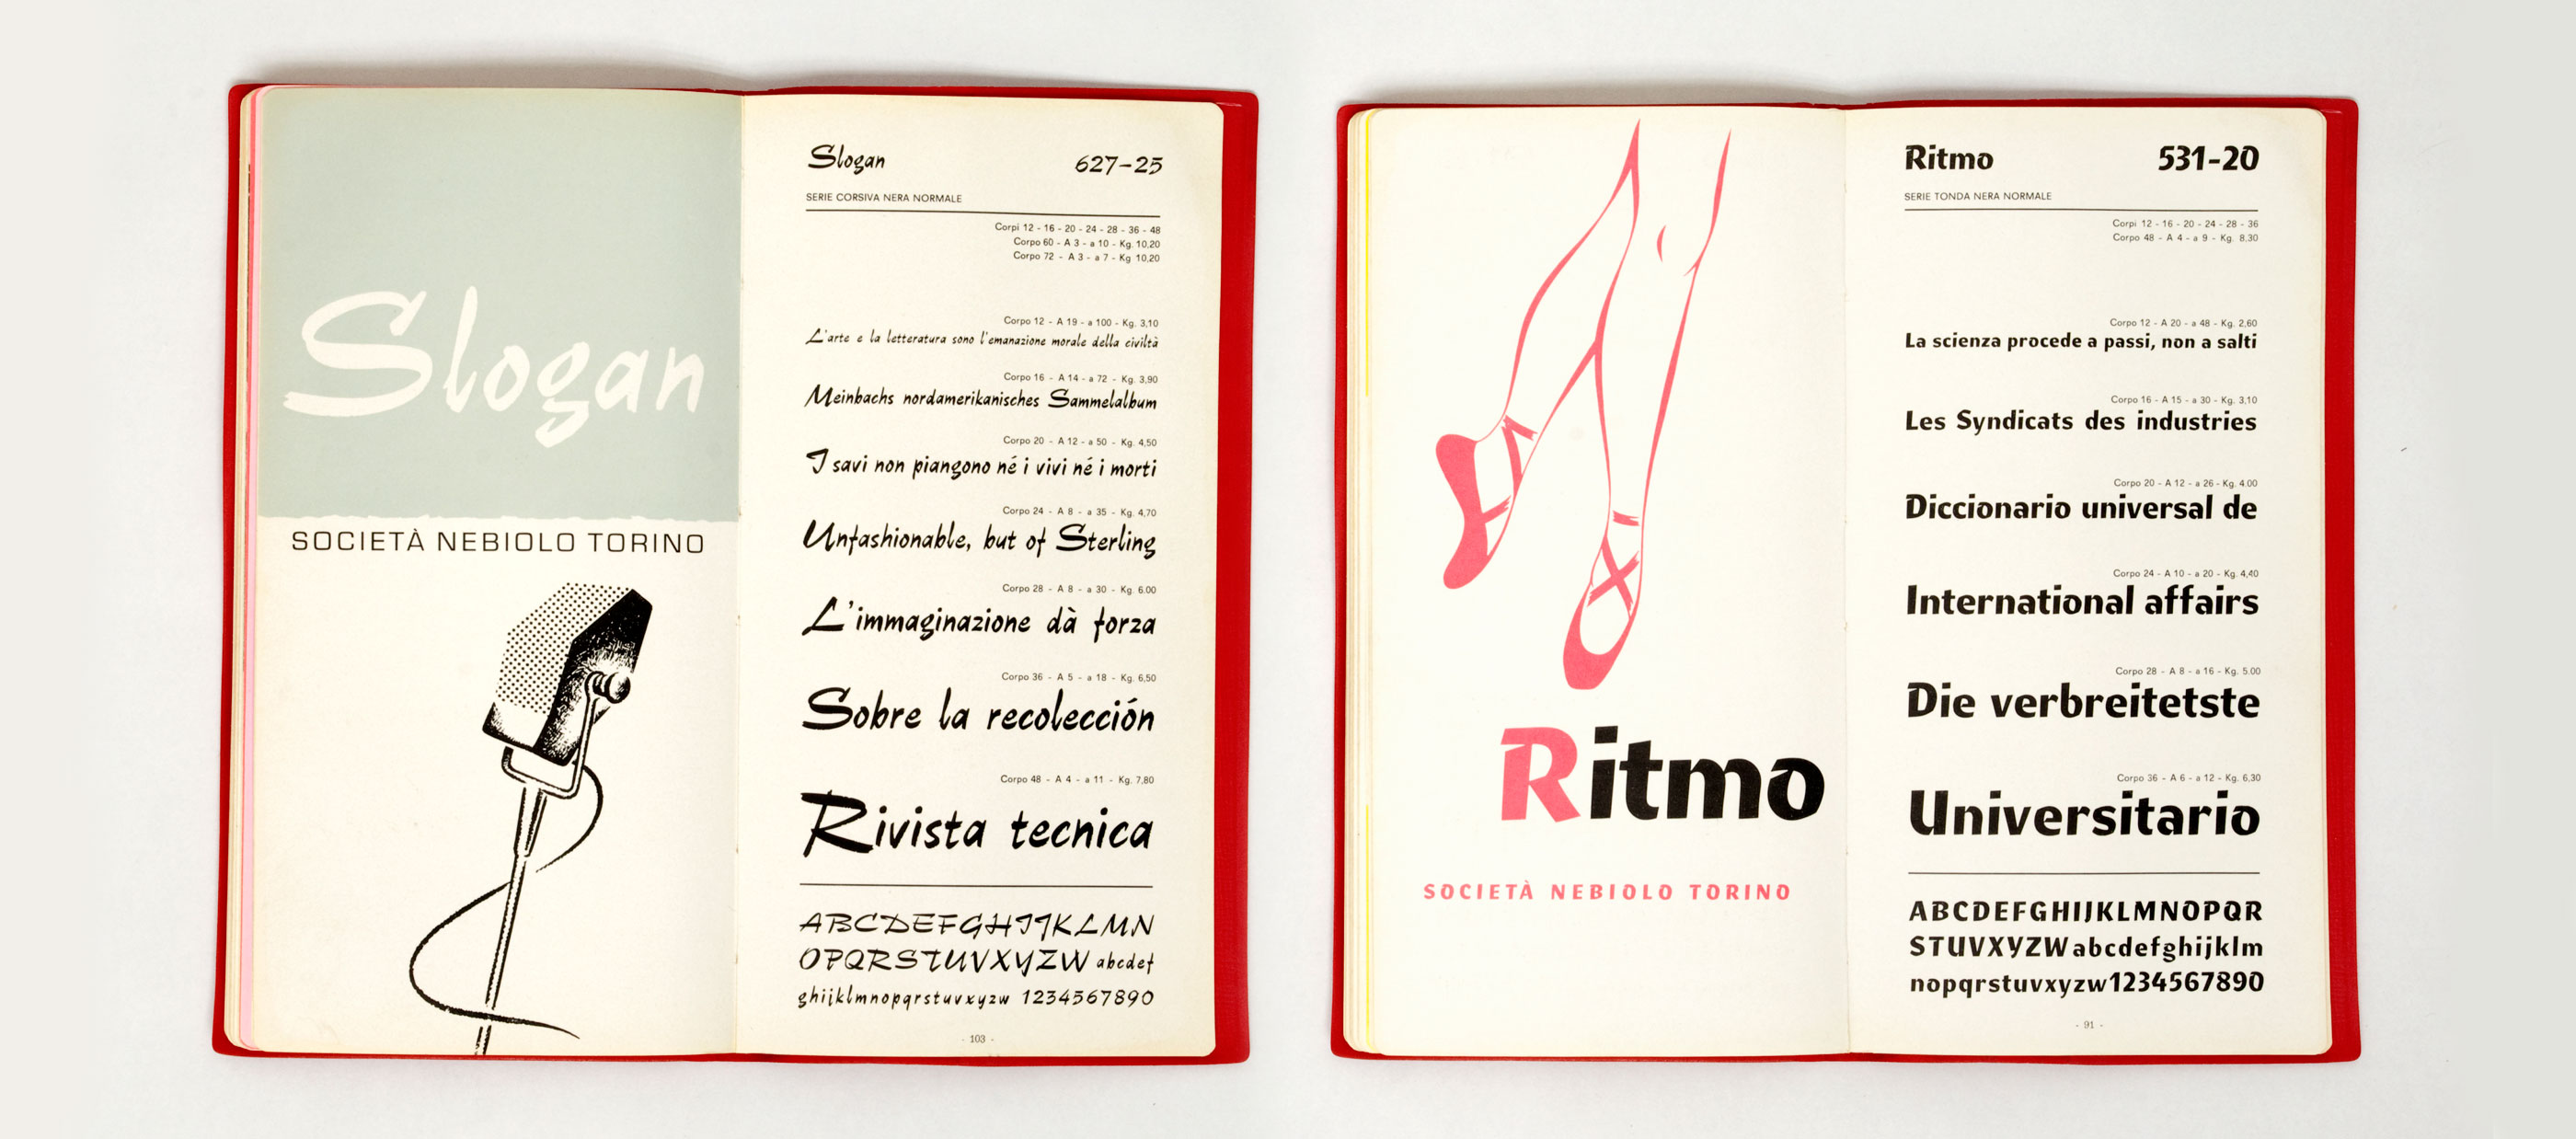 Aldo-Novarese-specimen-fonderie-Nebiolo-02